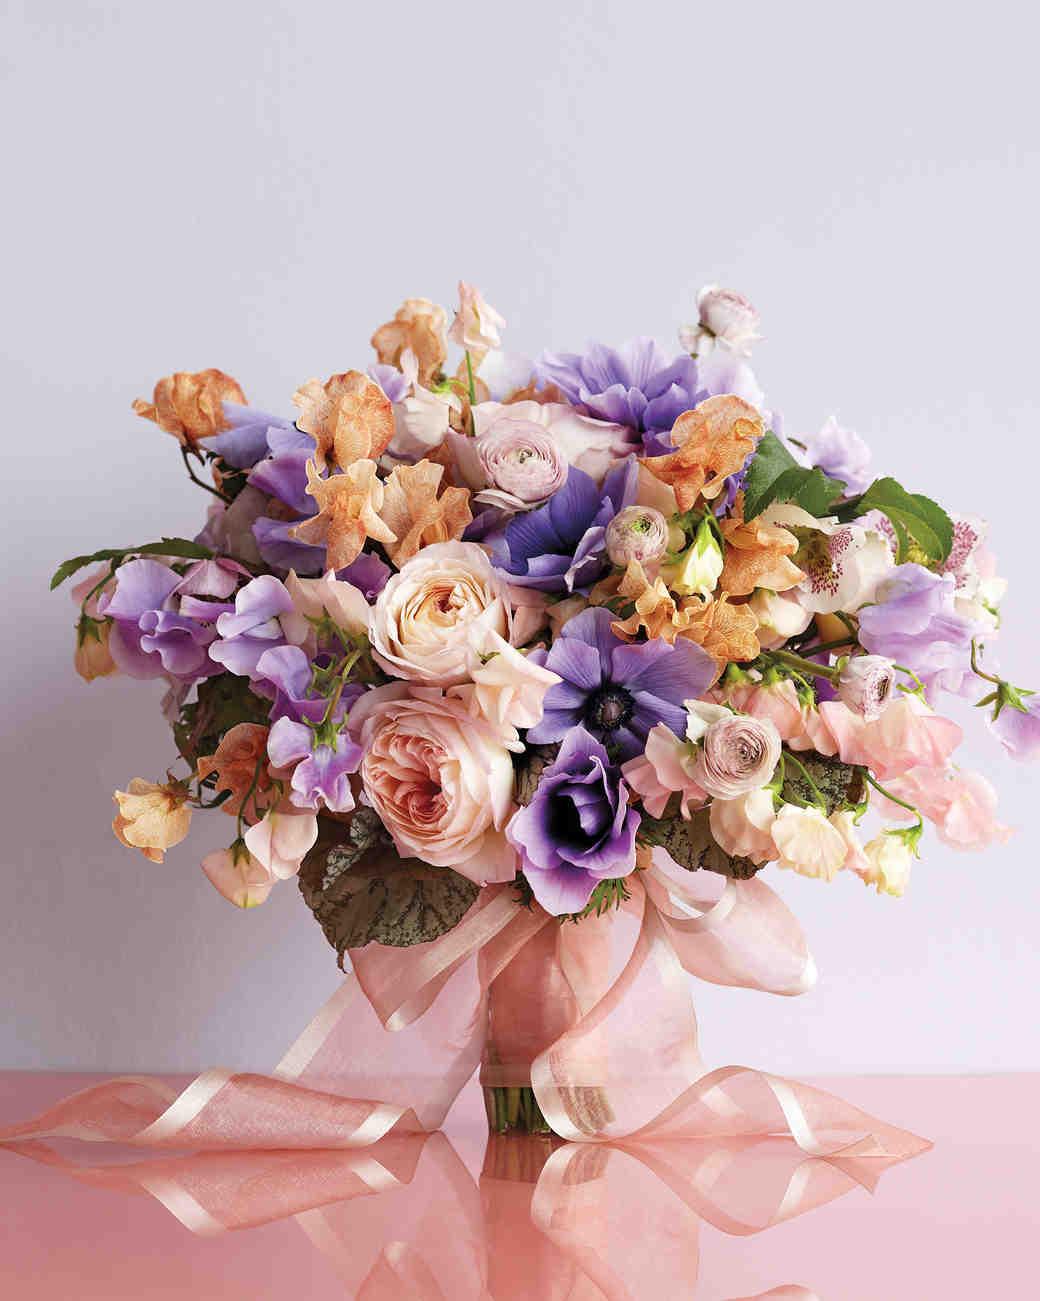 Martha Stewart Wedding Flowers Centerpieces : Pretty in pink wedding bouquet ideas martha stewart weddings